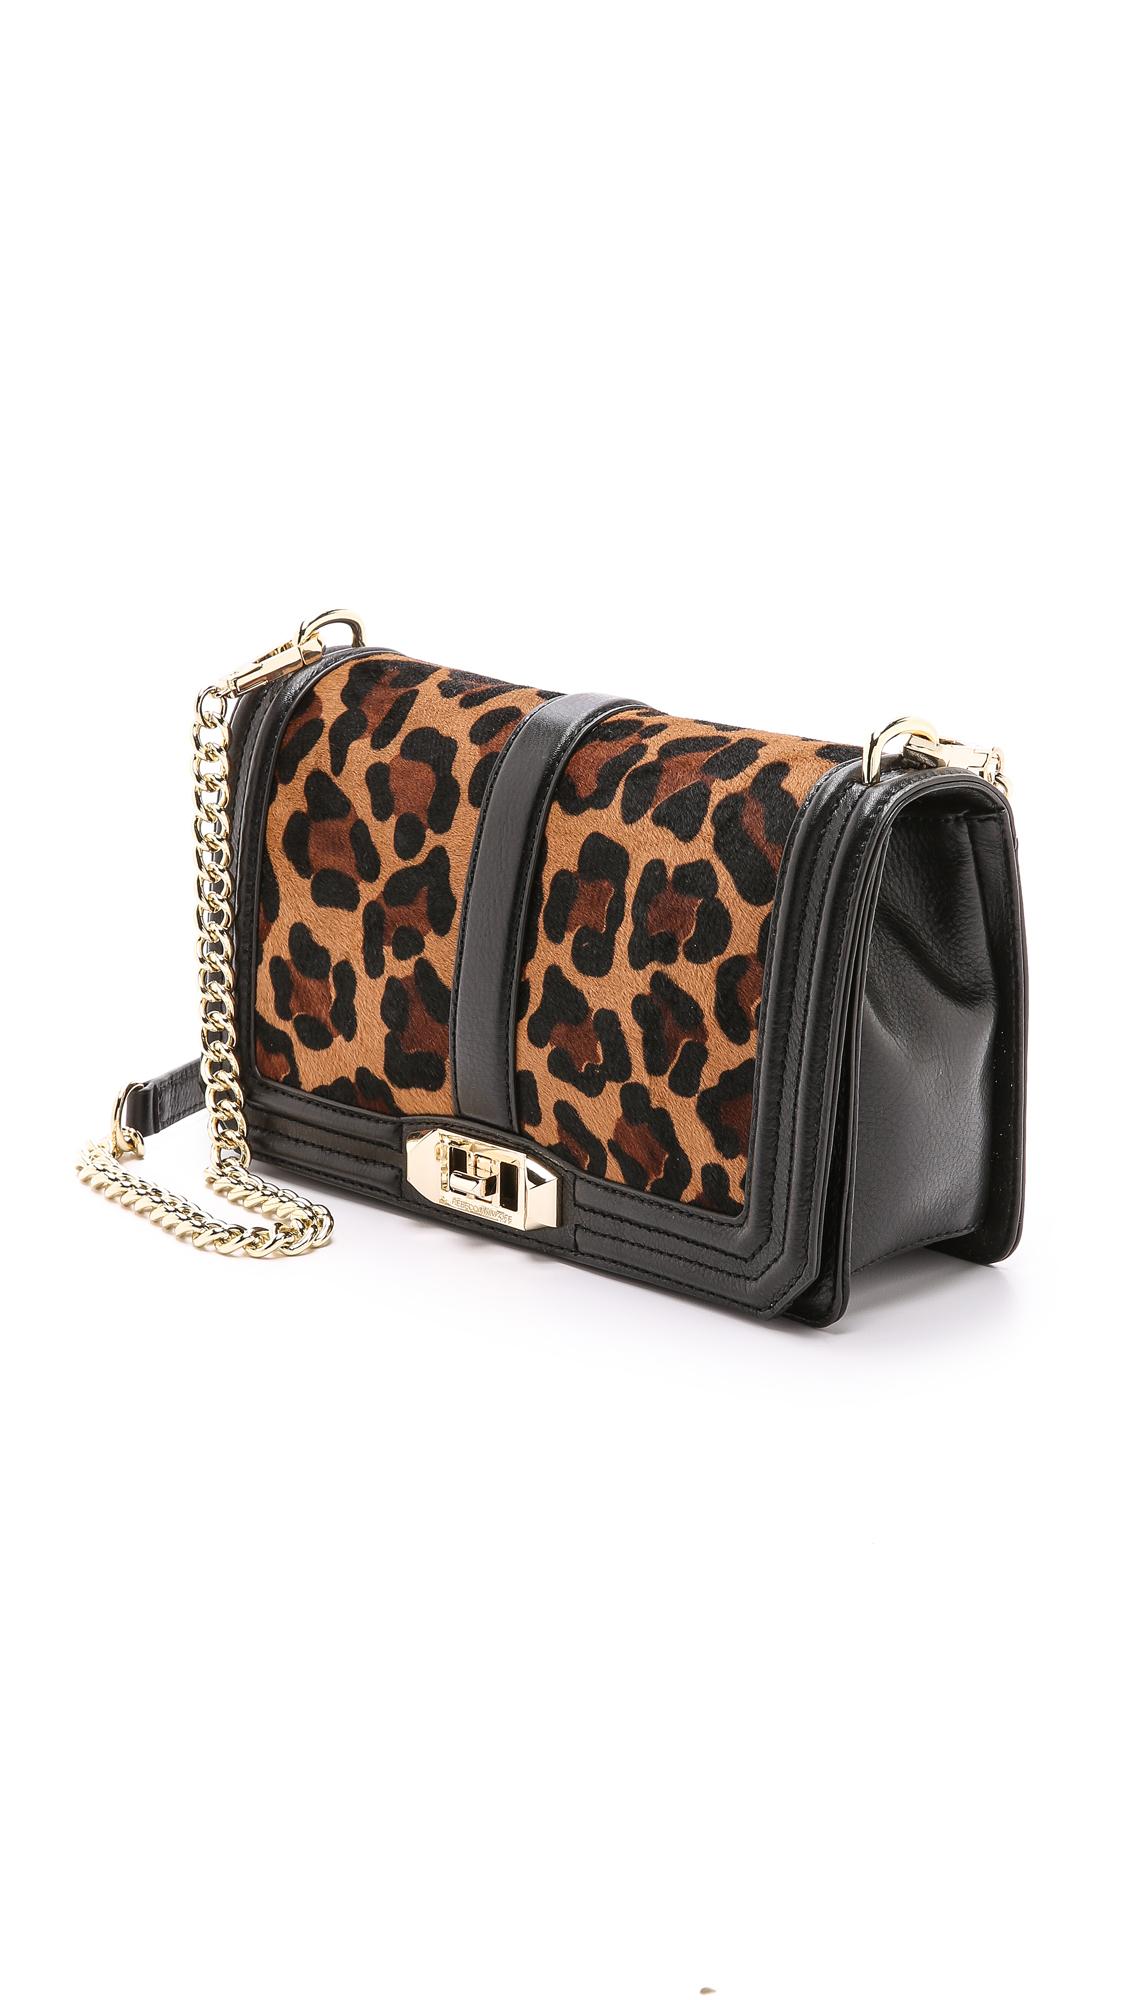 5bb8859858a2 Rebecca Minkoff Leopard Bag - Best Picture HD Leopard In The World